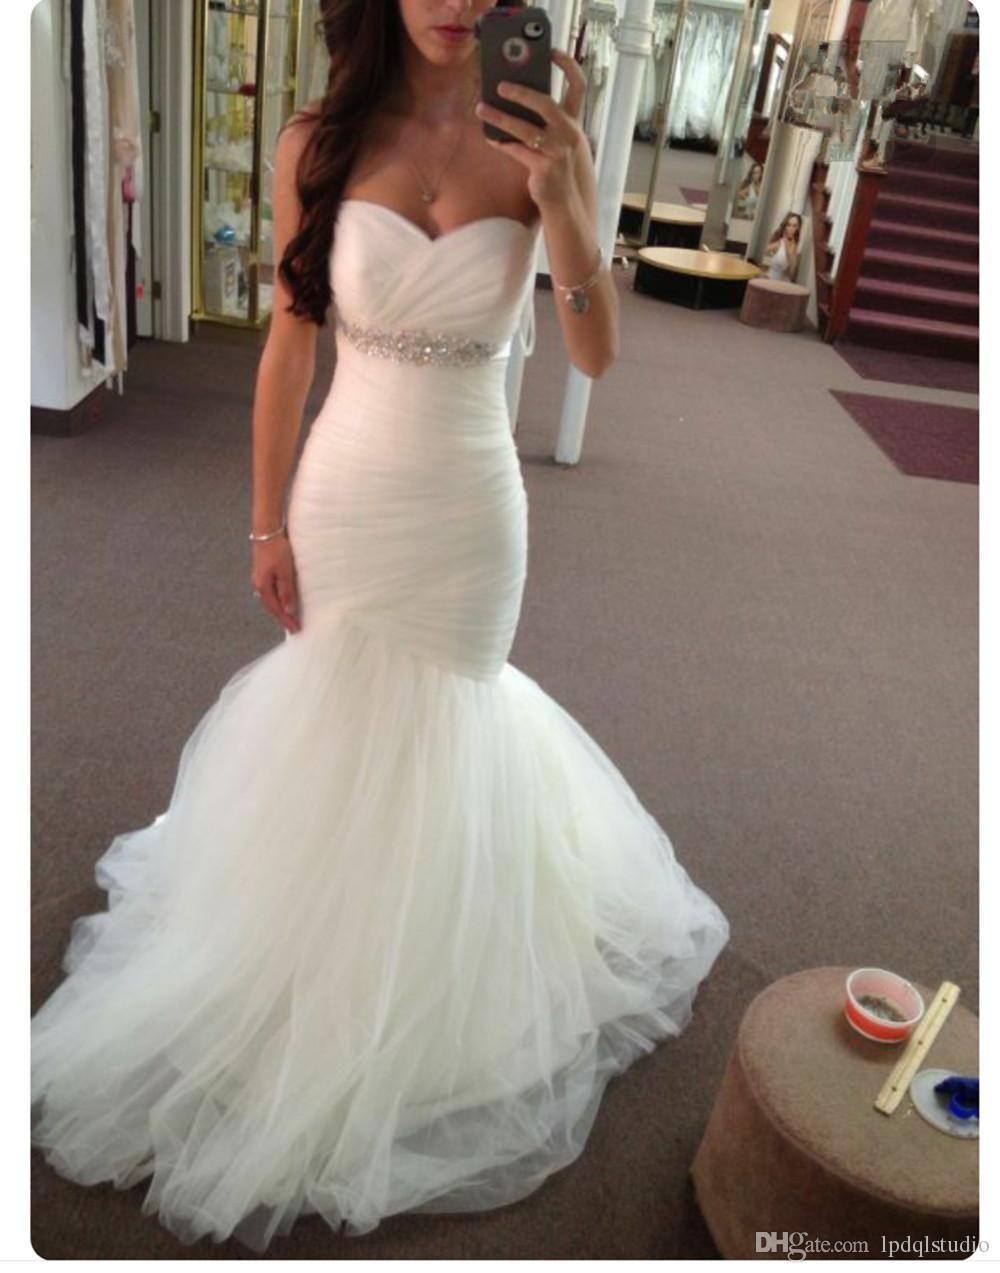 6072316efbc Sexy Mermaid Wedding Dresses Ivory Bridal Gowns Strapless Sparkling Sash  Sweep Train Wedding Gowns Lace-up Zipper Back Wedding Dress Wedding Dresses  Mermaid ...